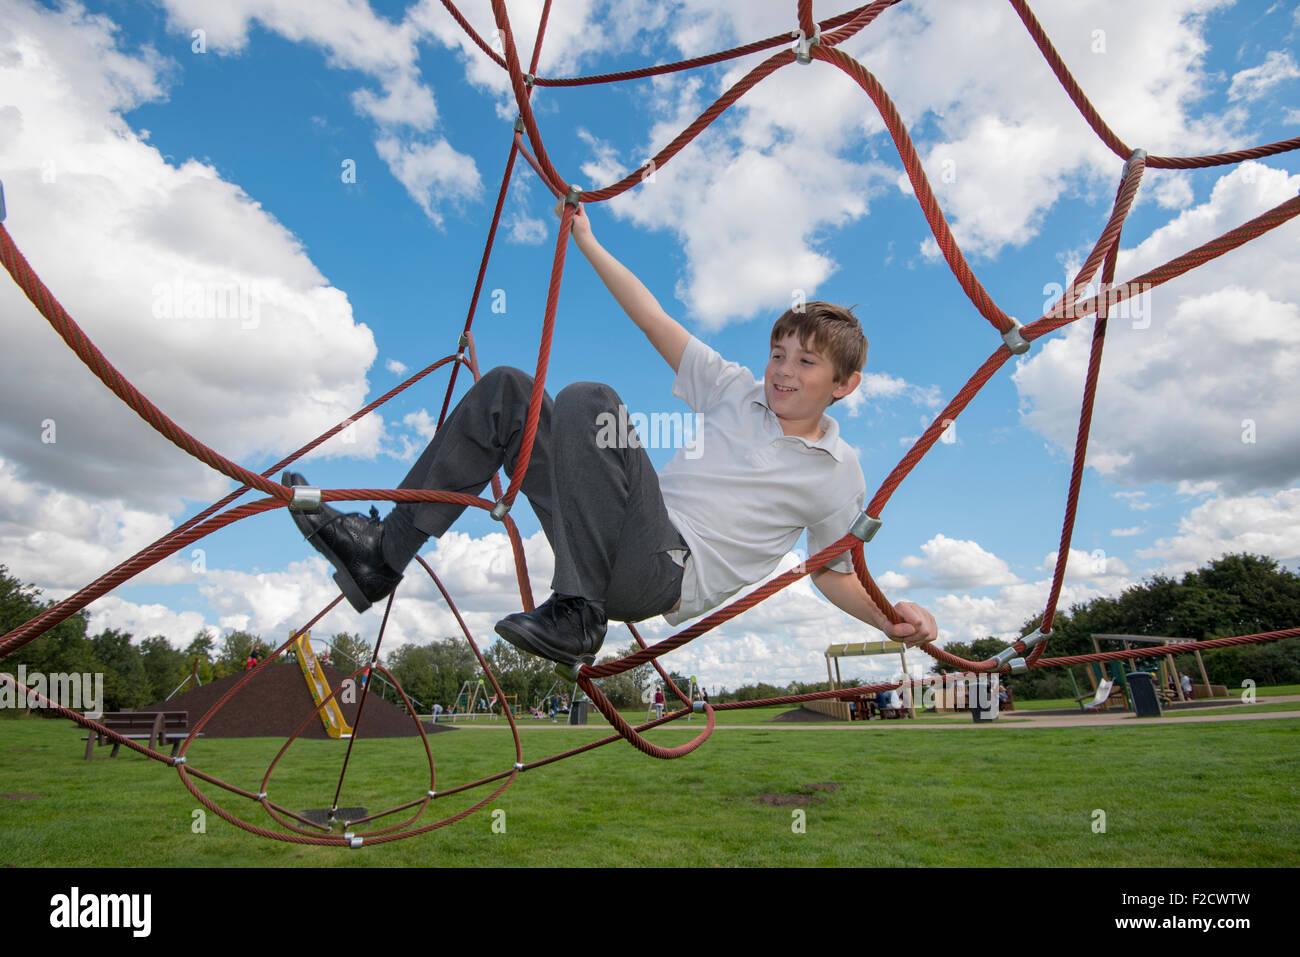 Junge Seil Klettergerüst Stockfoto, Bild: 87564873 - Alamy